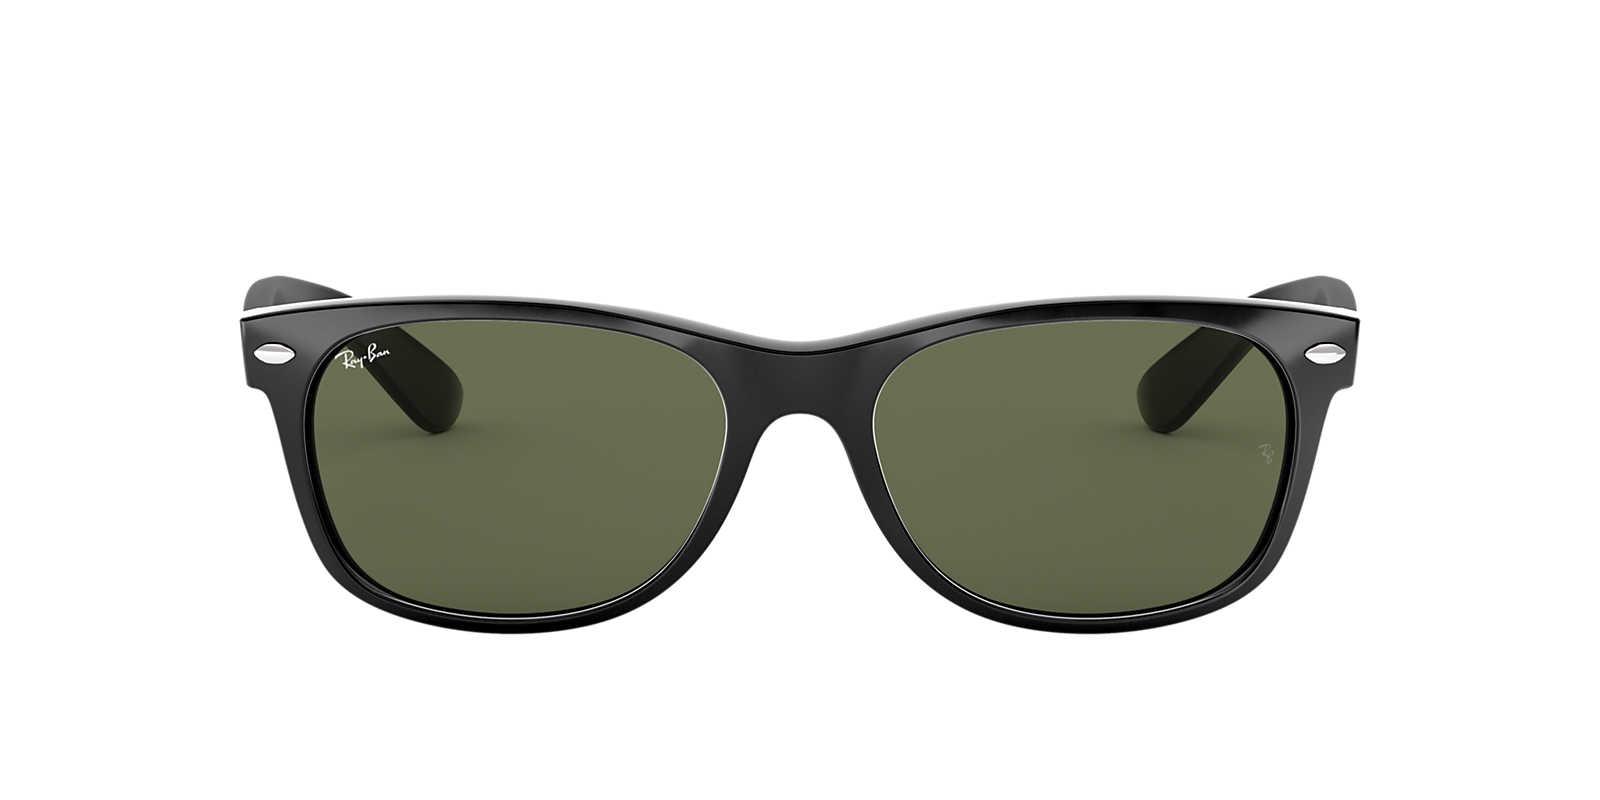 Ray ban sunglasses sale new zealand - Ray Ban Black Rb2132 Green Lenses 51mm